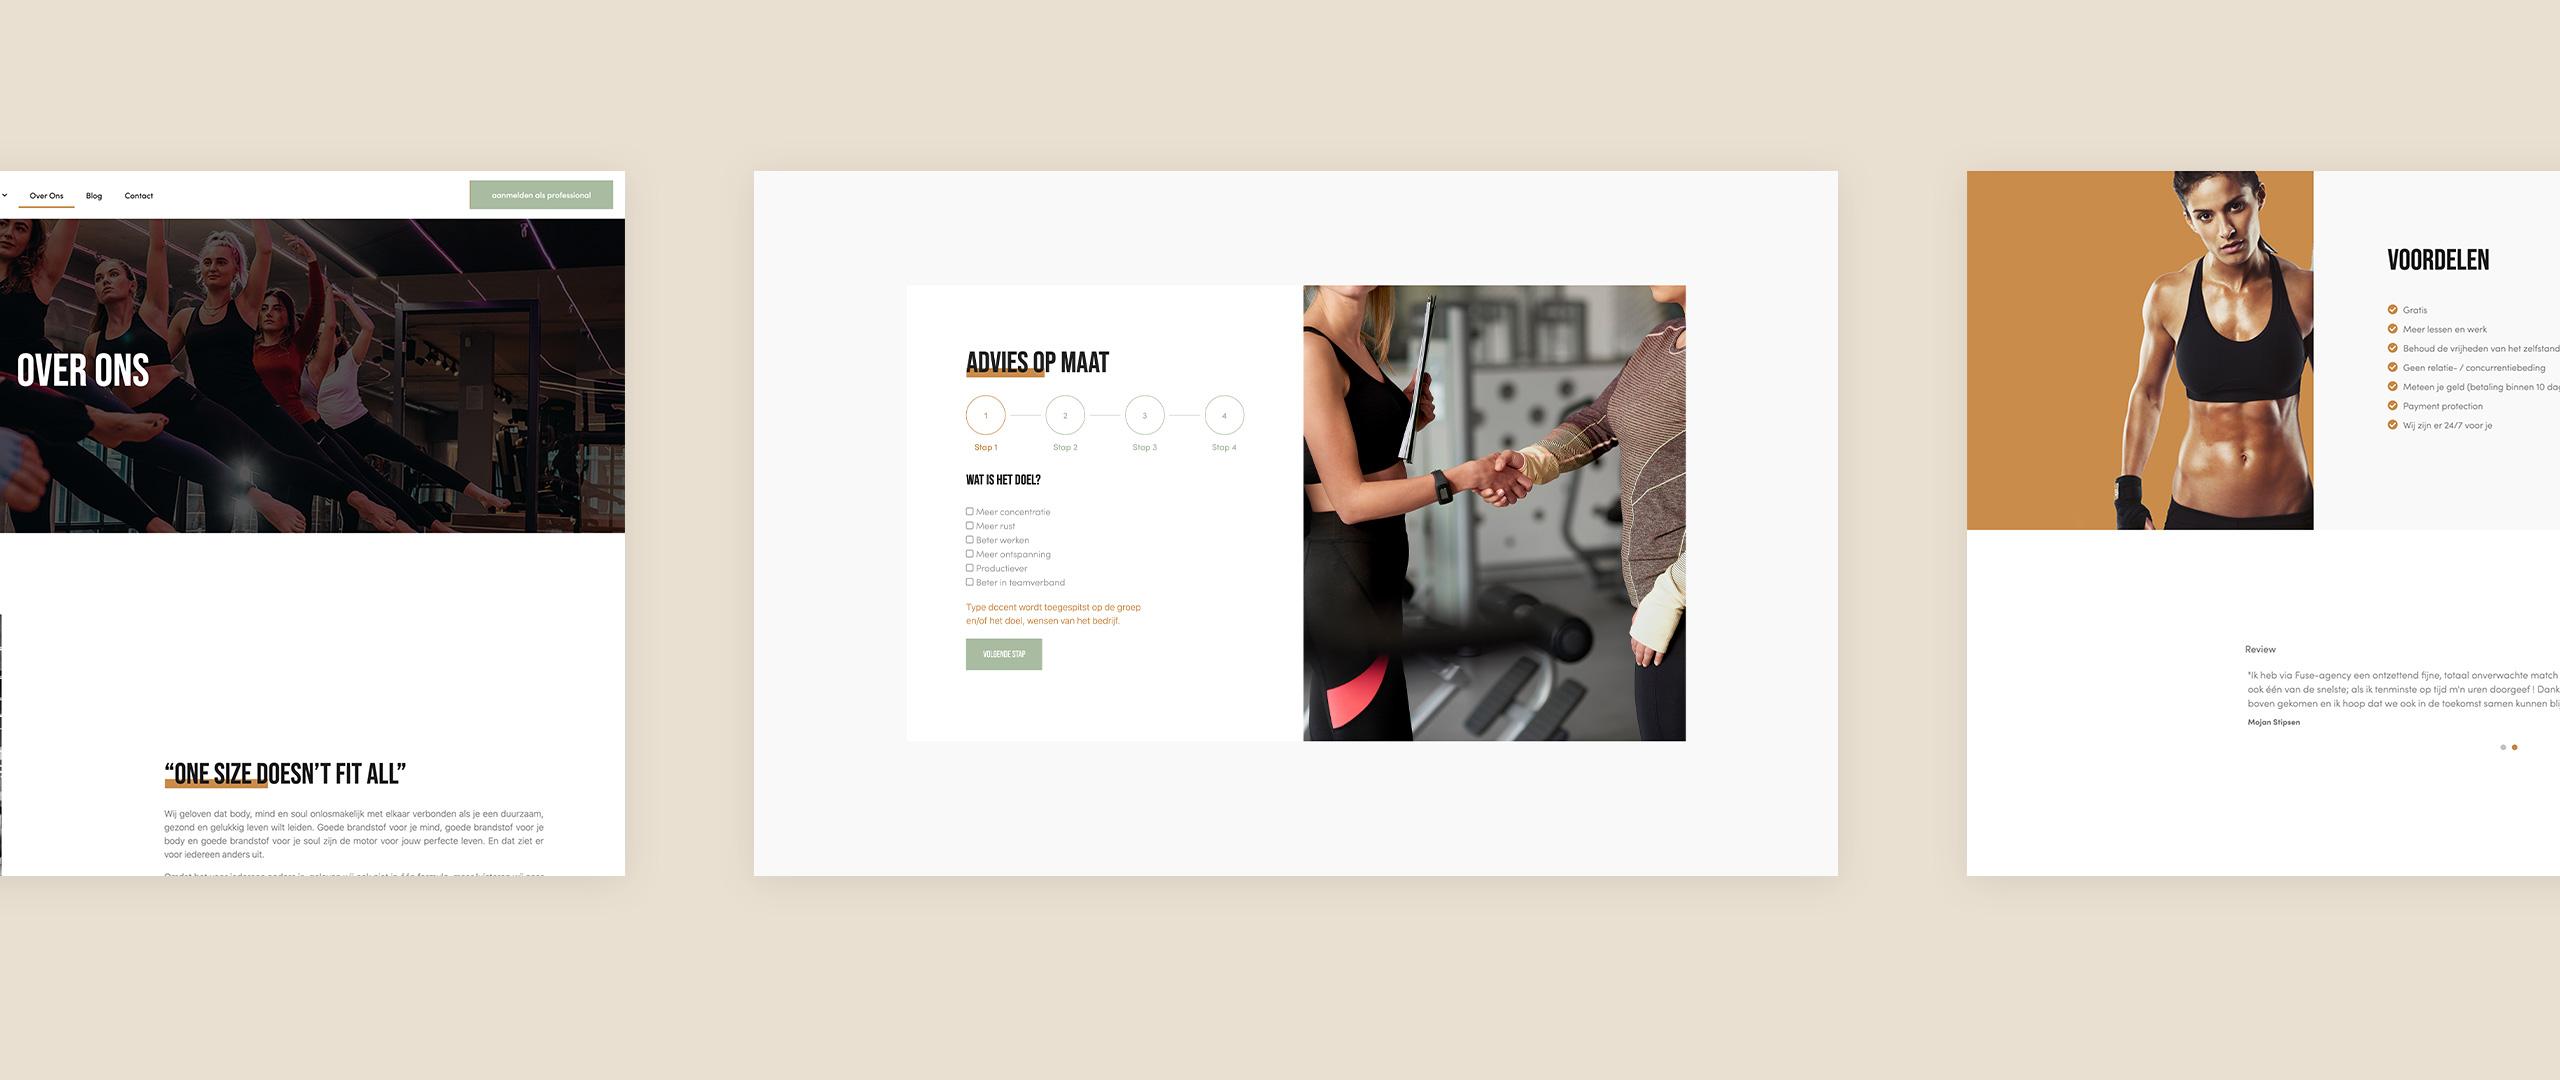 Fuse website screens